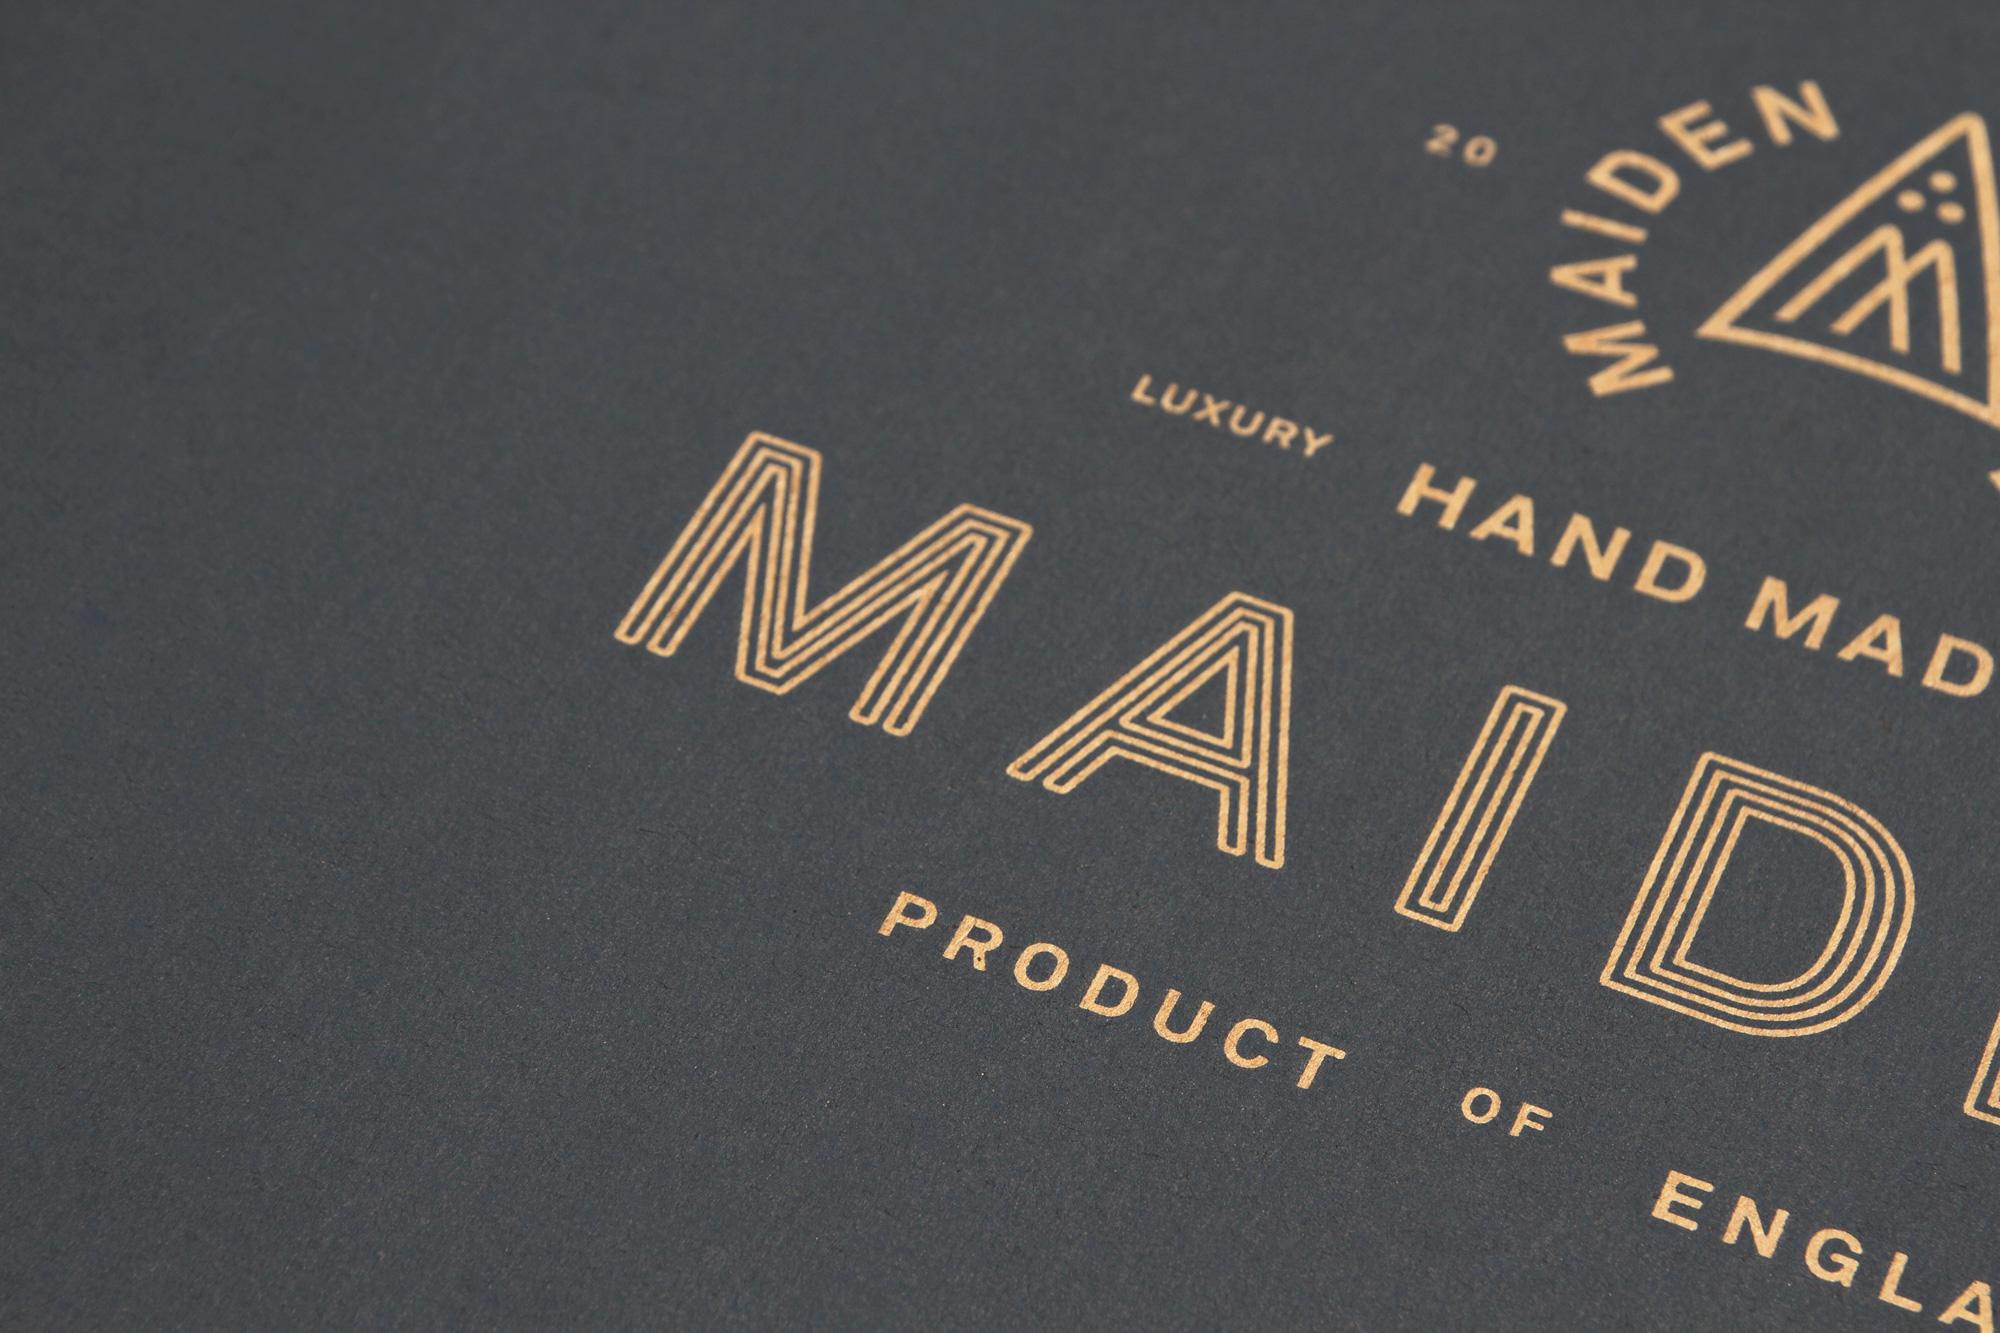 New Work — MAIDEN.BRANDING + PACKAGING.#logo #Brand #Branding #Design #Graphicdesign #Luxury #pattern #packagingdesign #packaging #British #NewRelease #Style #contemporary #handmade #london #dorset #graphicdesigner #graphicdesign #designagency #brandingagency #experience #candles #luxury #luxurydesign #luxurylifestyle